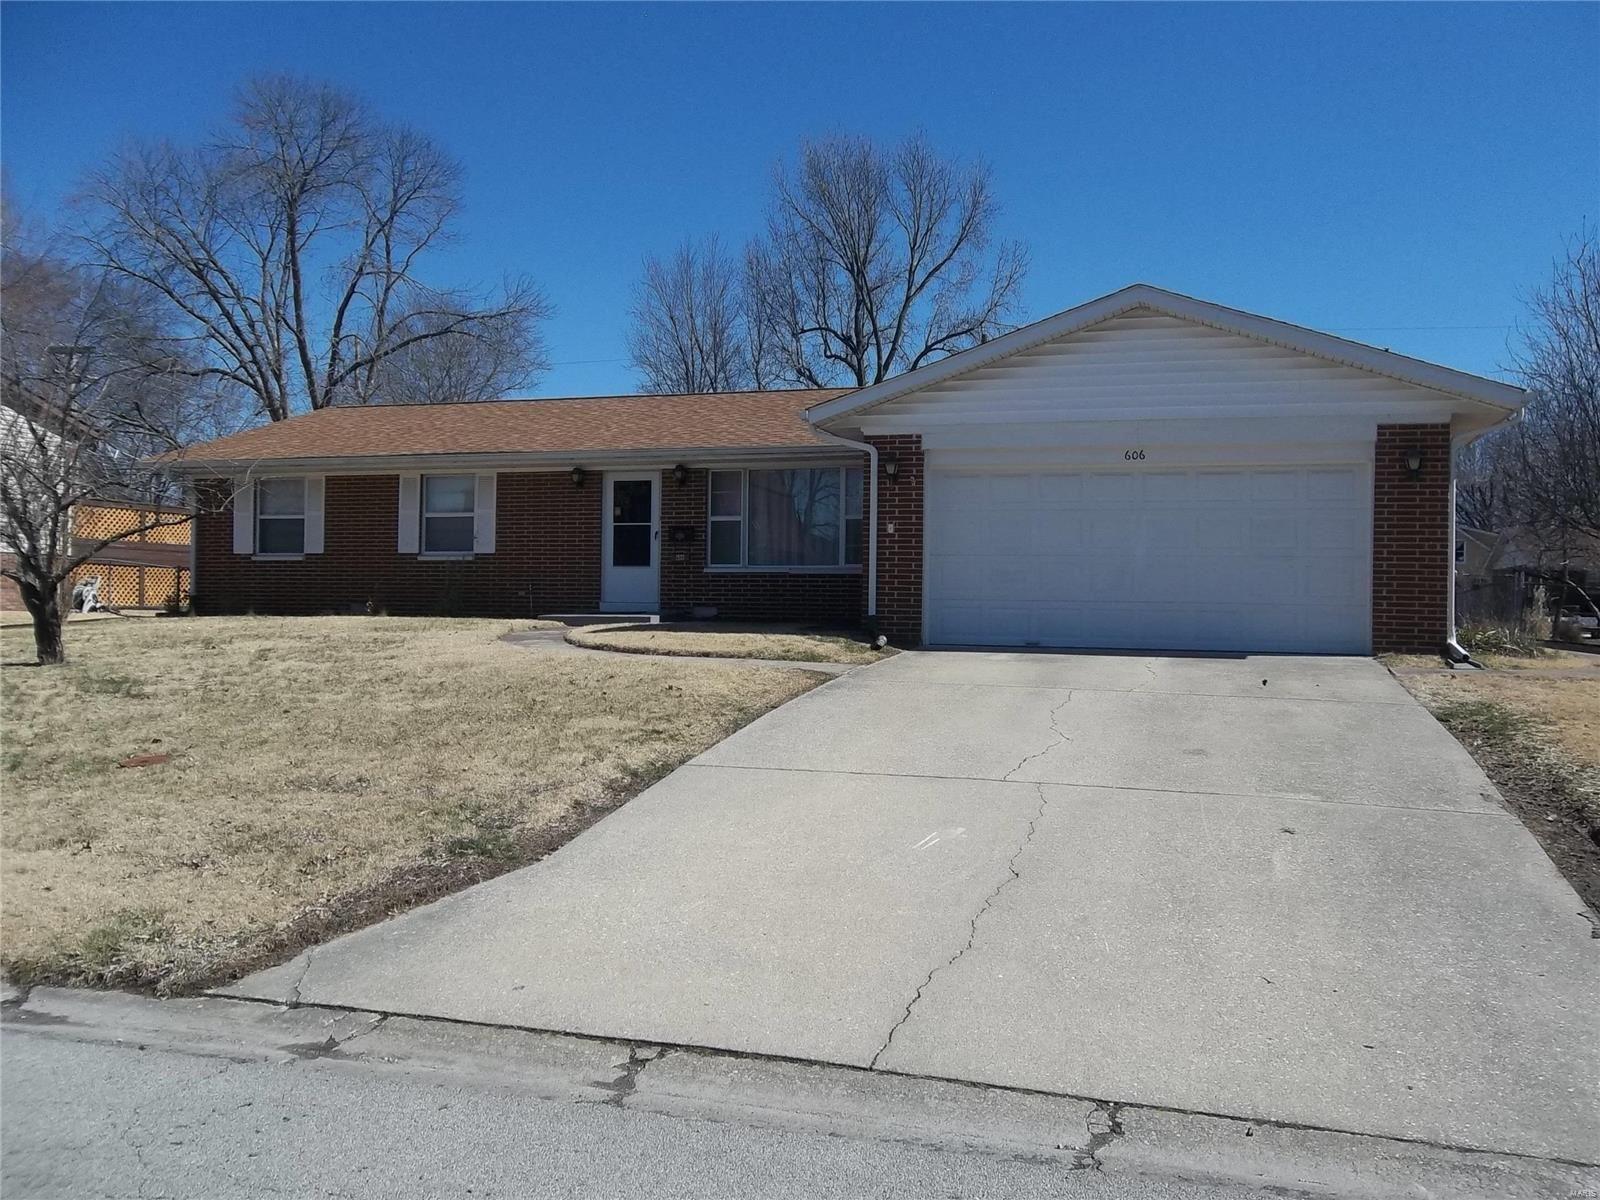 606 North Cherry Street, OFallon, IL 62269 - MLS#: 20013357